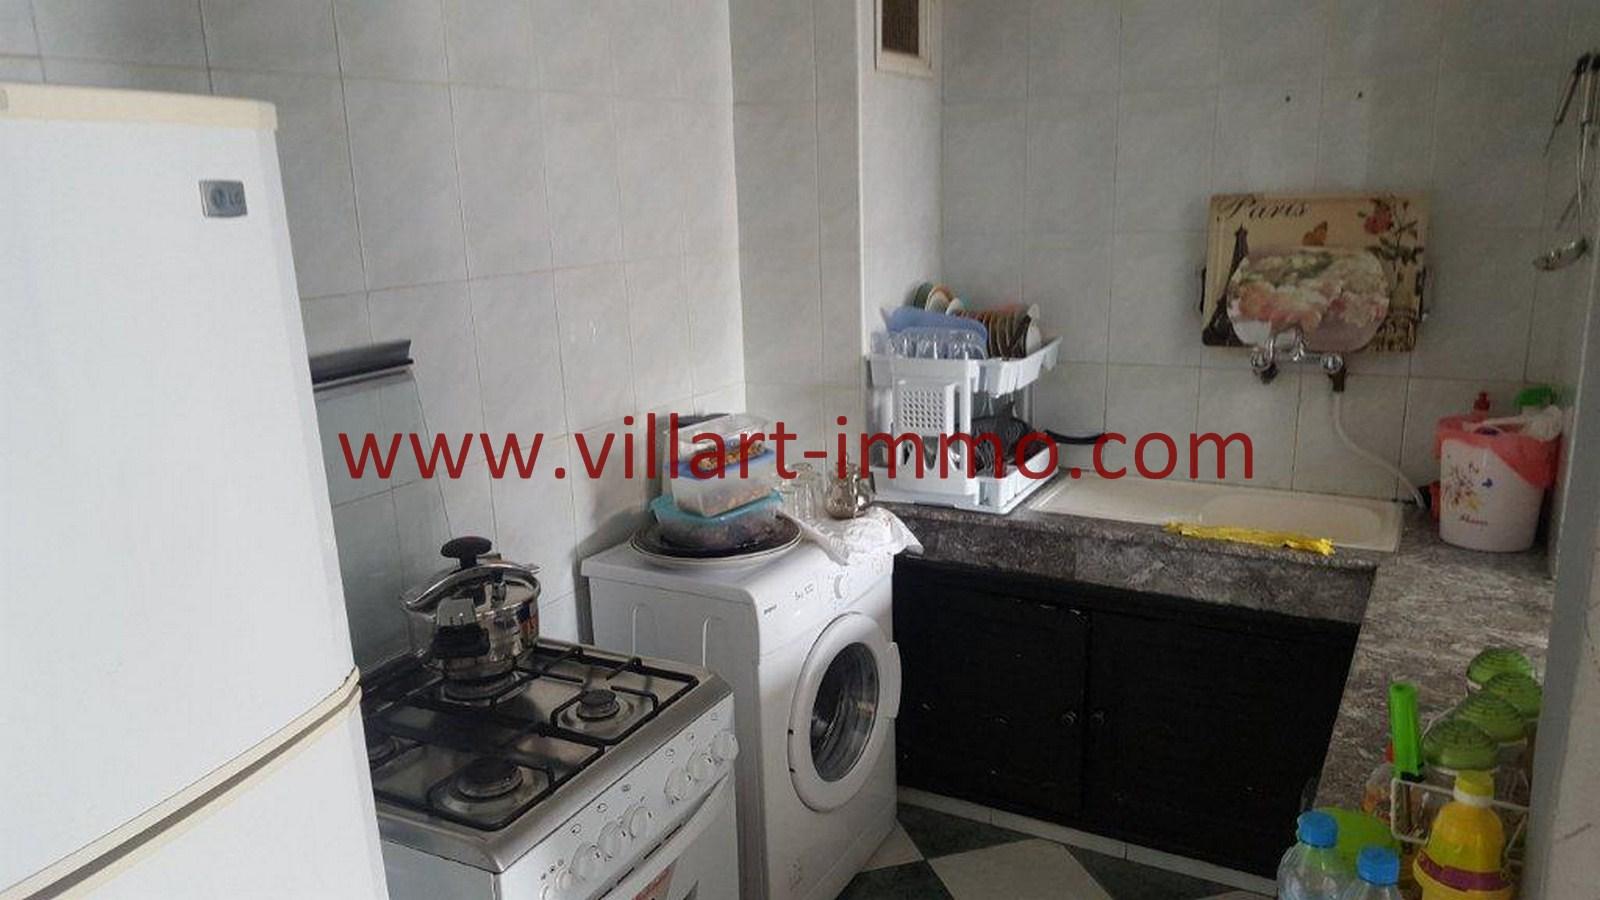 6-Vente-Appartement-Tanger-Malabata-Cuisine-VA507-Villart Immo